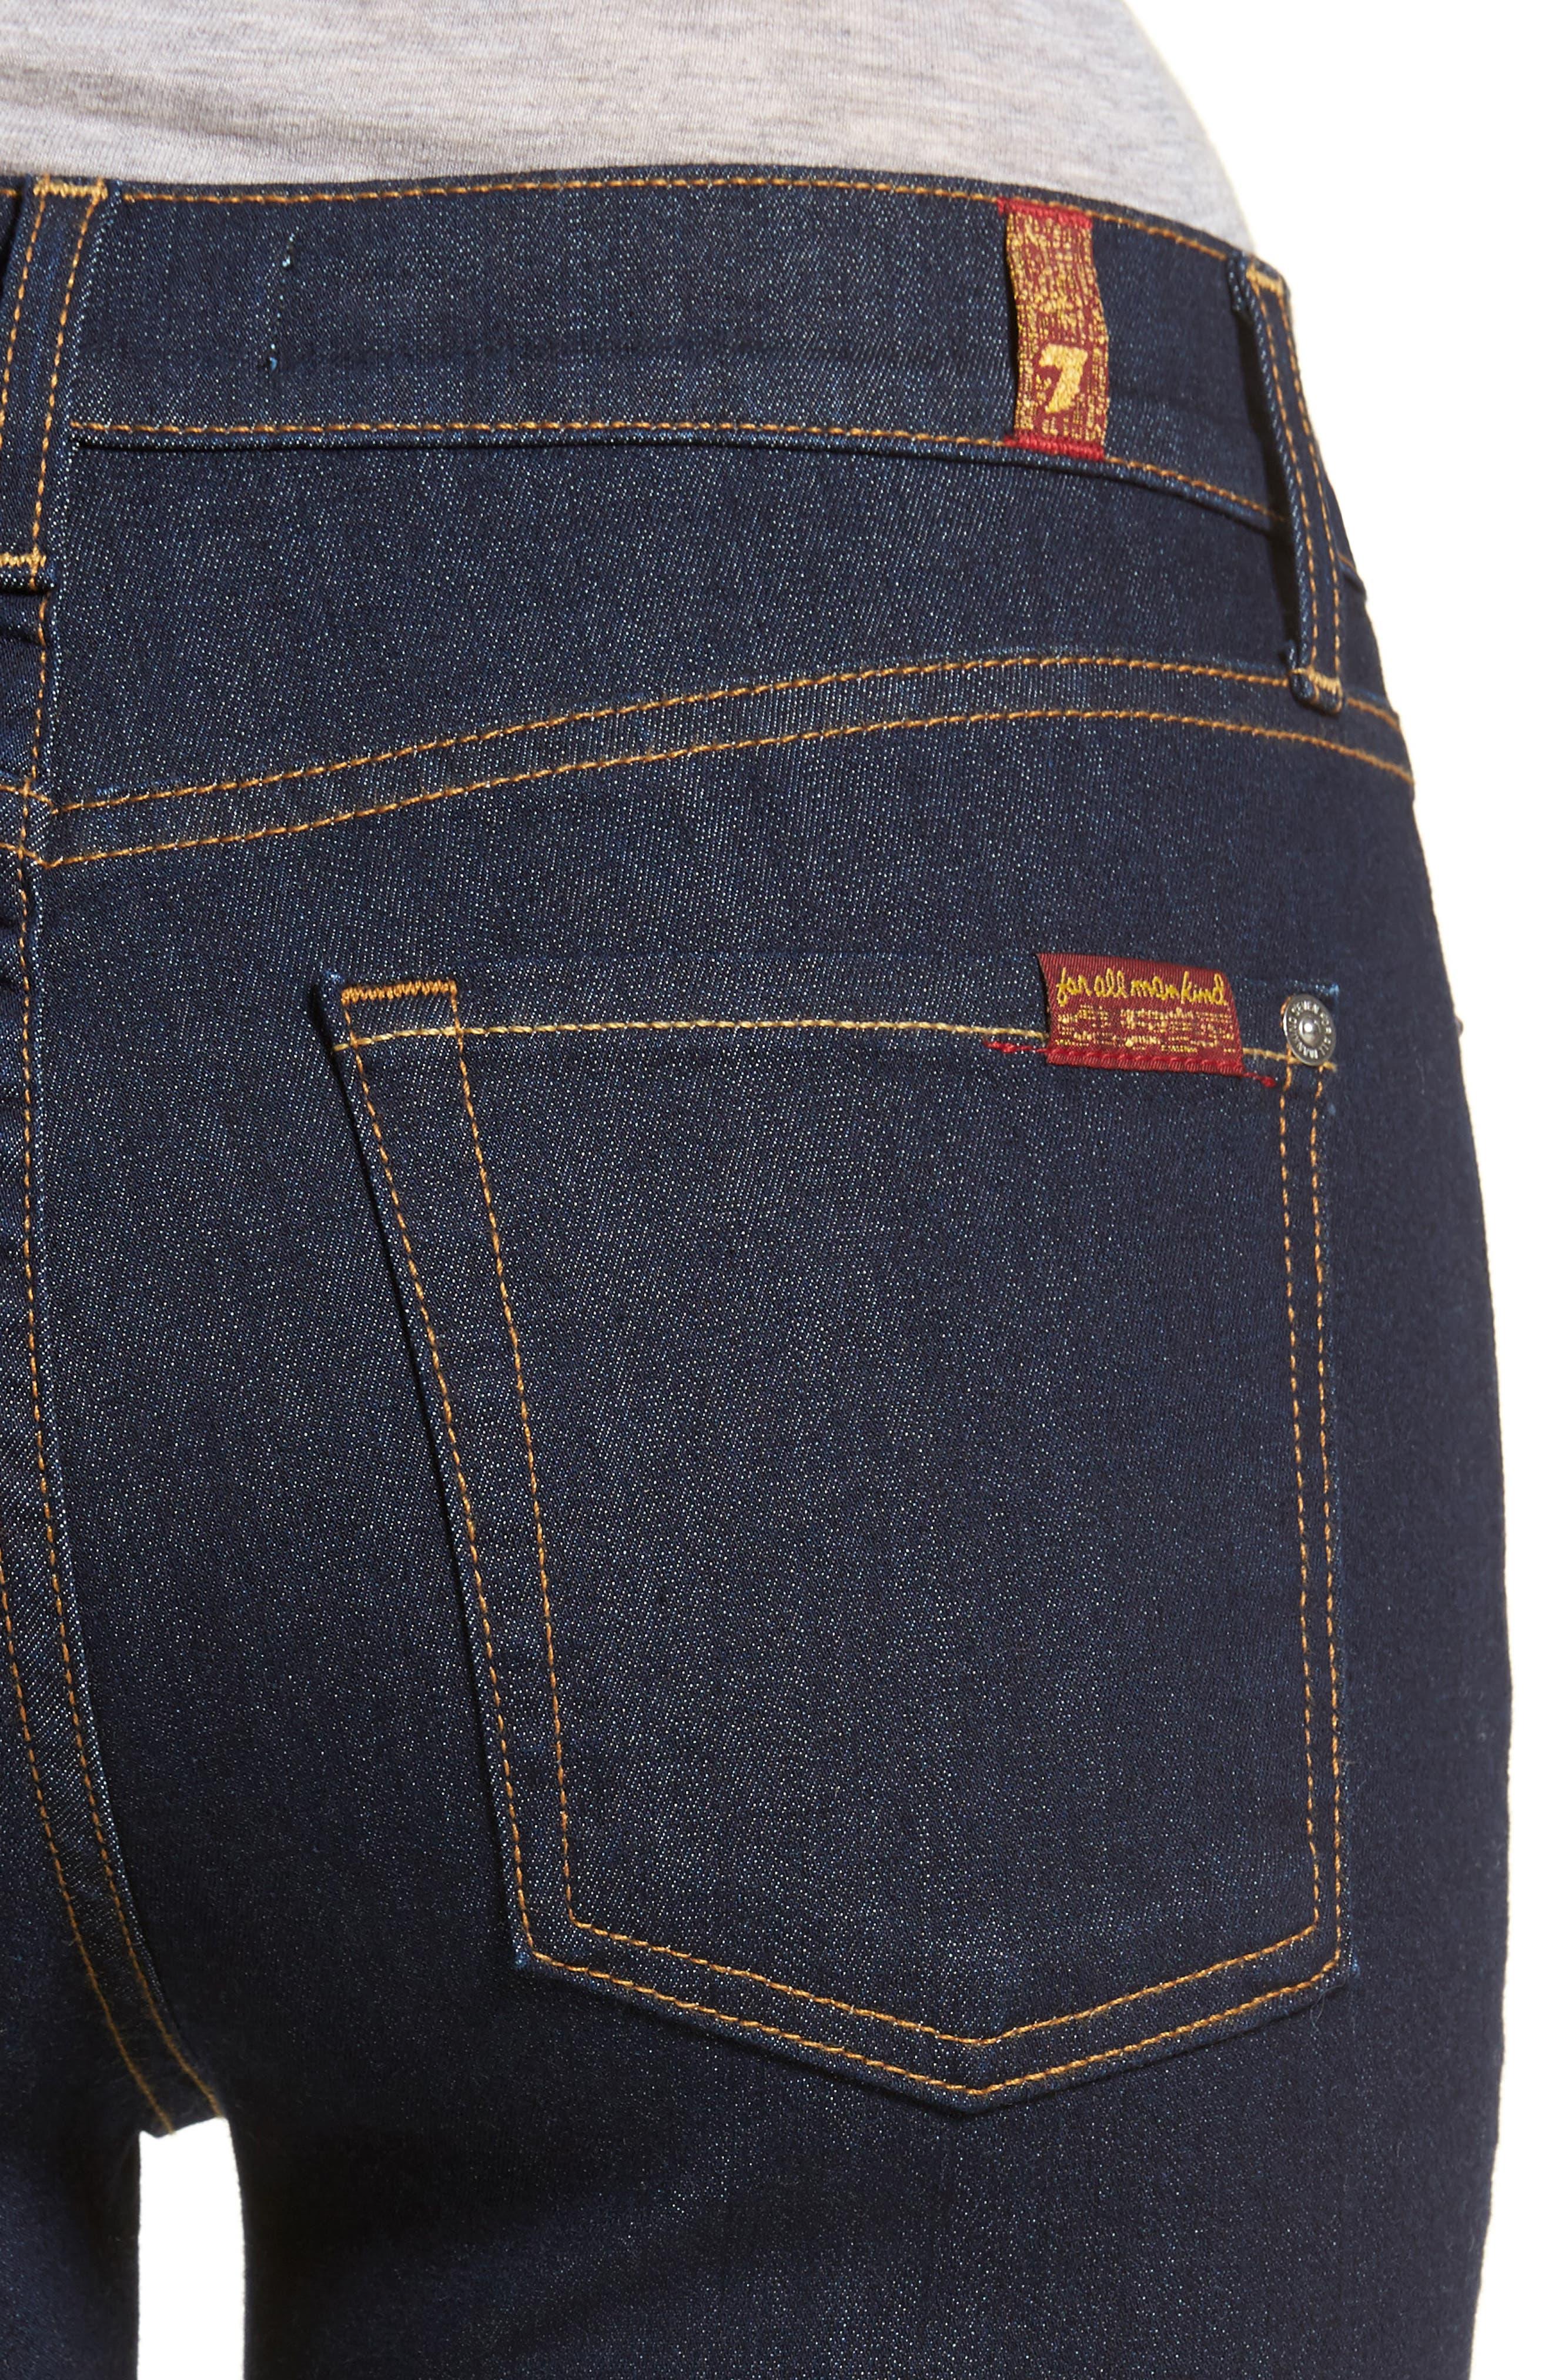 b(air) Roxanne Ankle Skinny Jeans,                             Alternate thumbnail 4, color,                             401